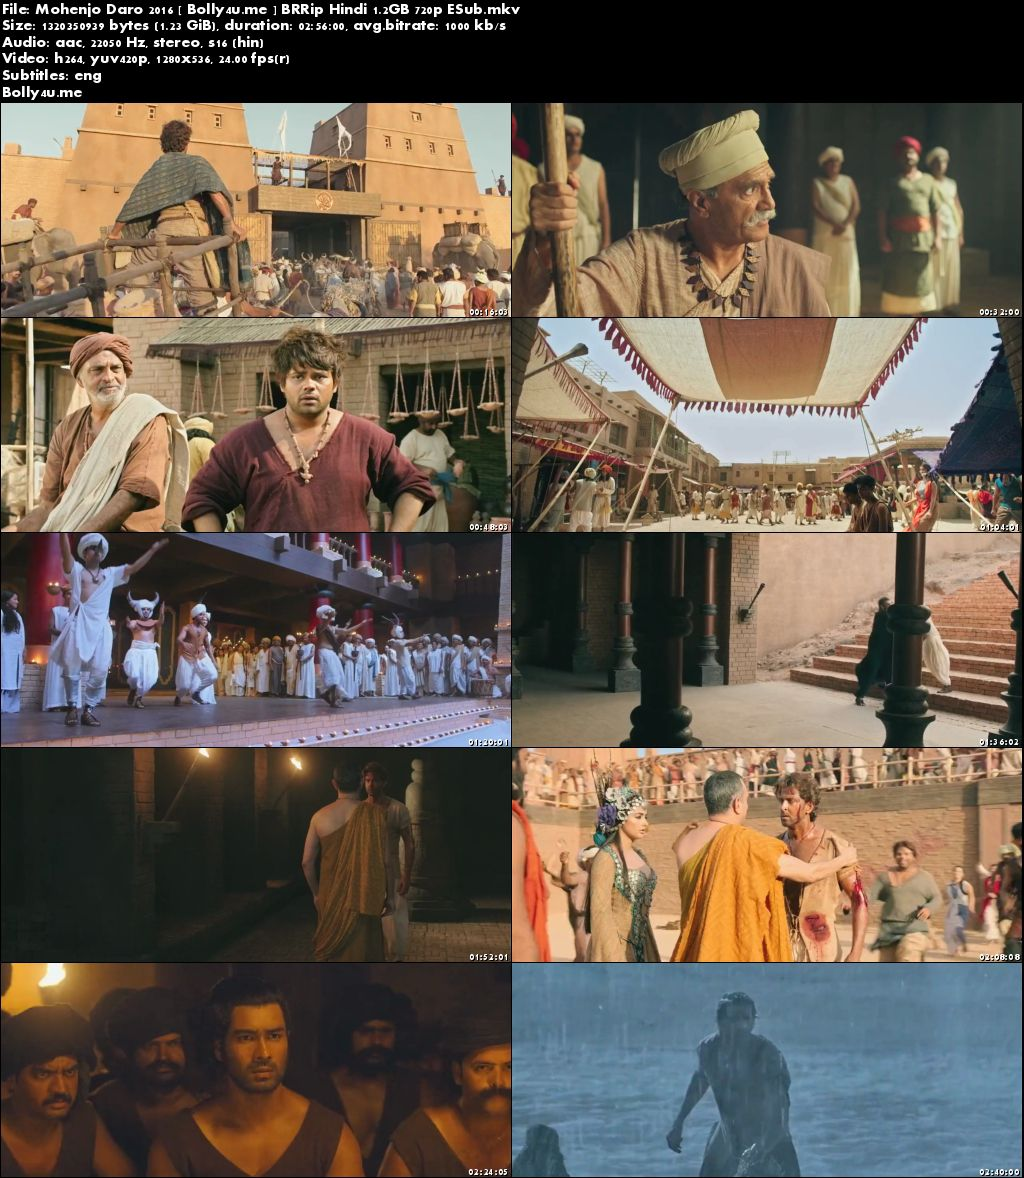 Mohenjo Daro 2016 BRRip Full Hindi Movie Download 720p ESub